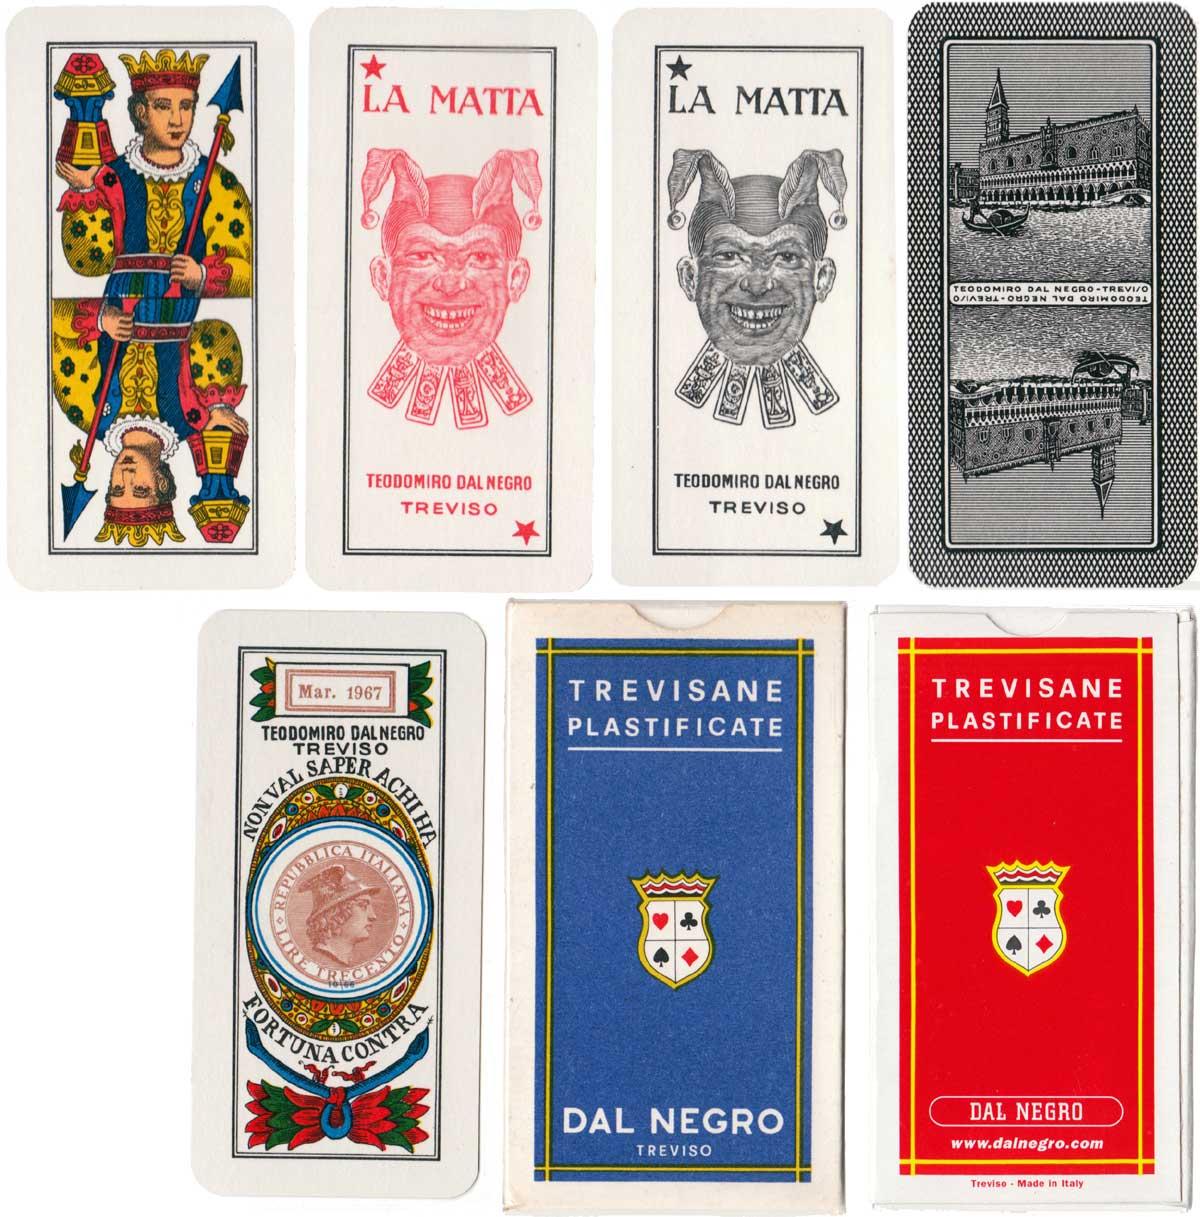 Trevisane pattern by Dal Negro, Treviso, 1971